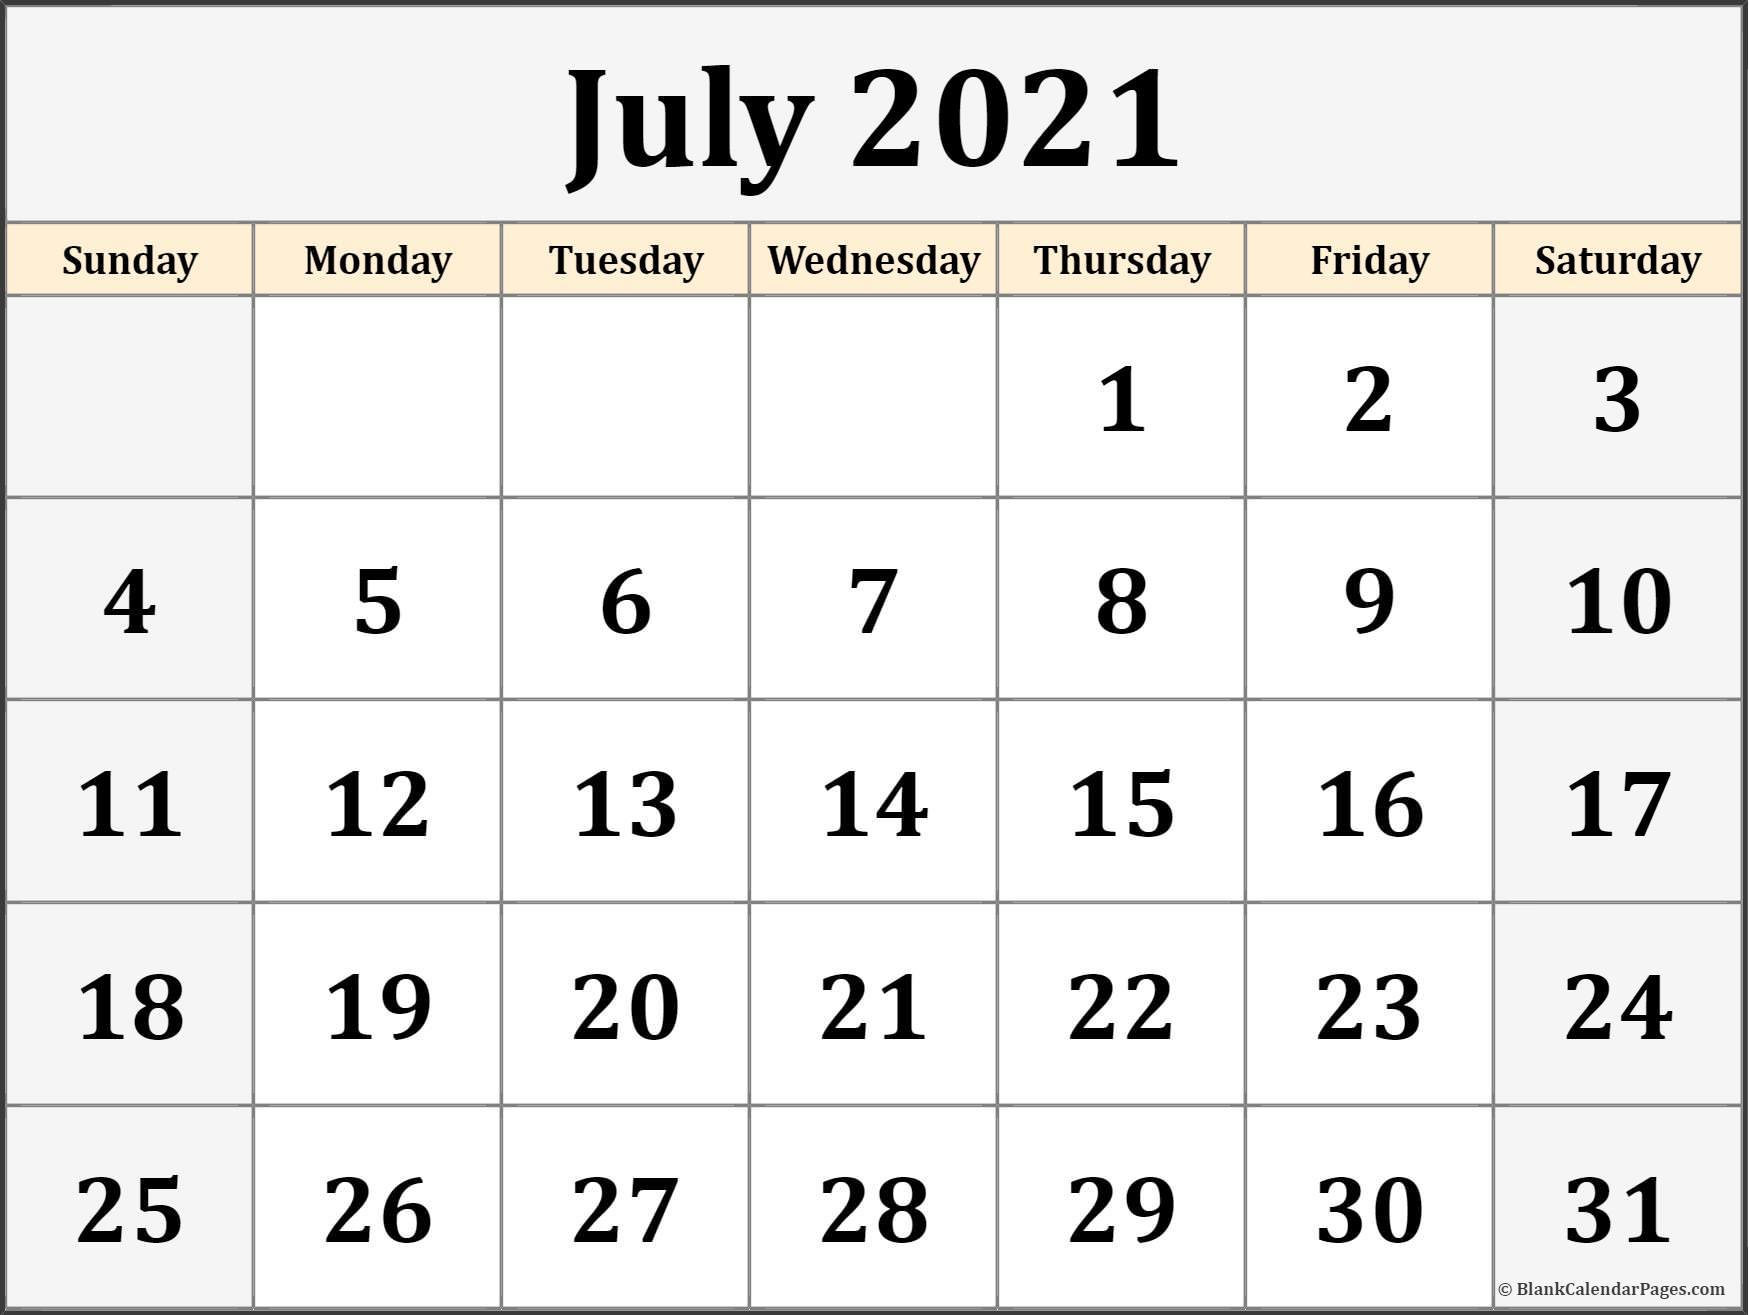 July 2021 Calendar Free Printable Monthly Calendars 1